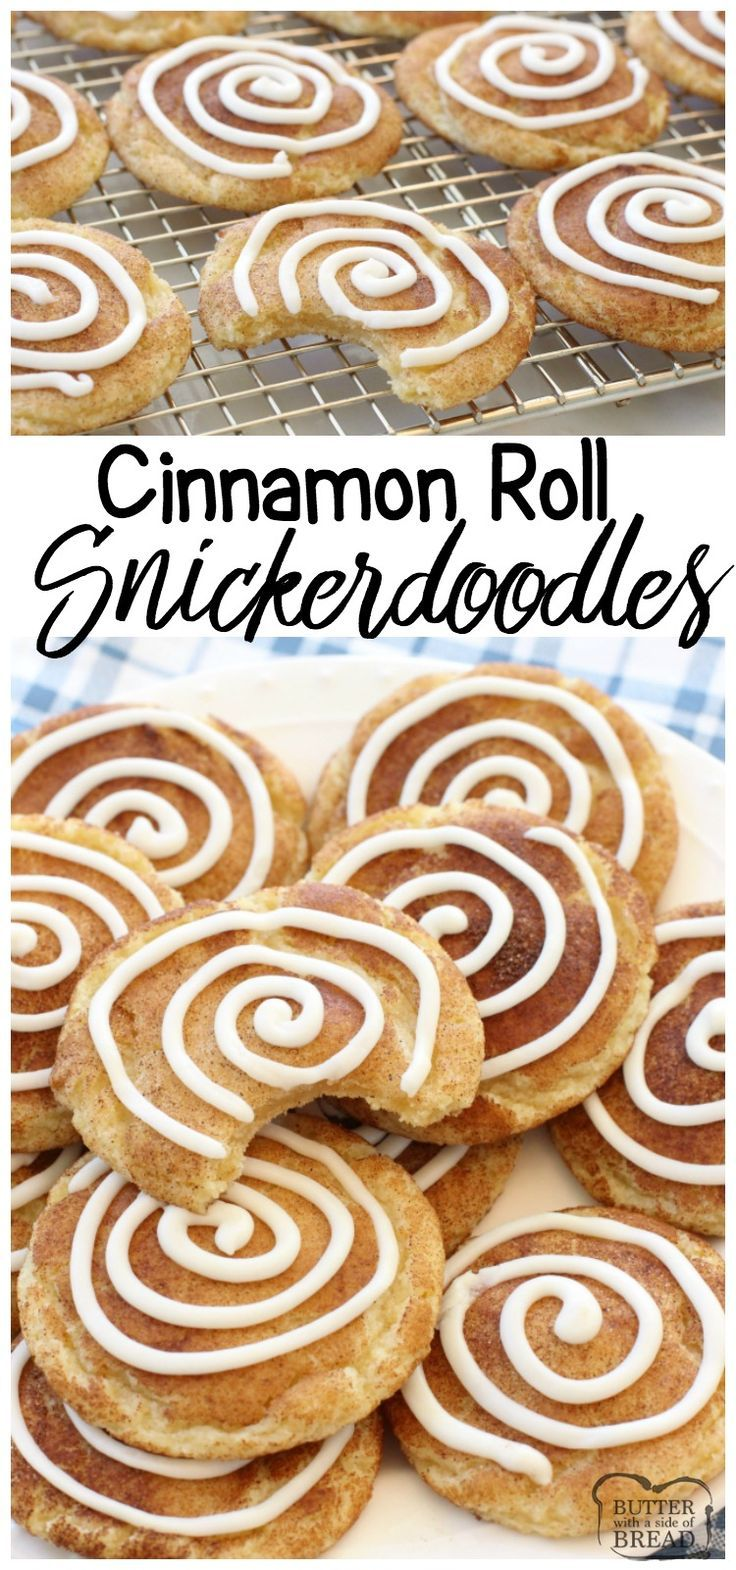 Snickerdoodles recipes easy